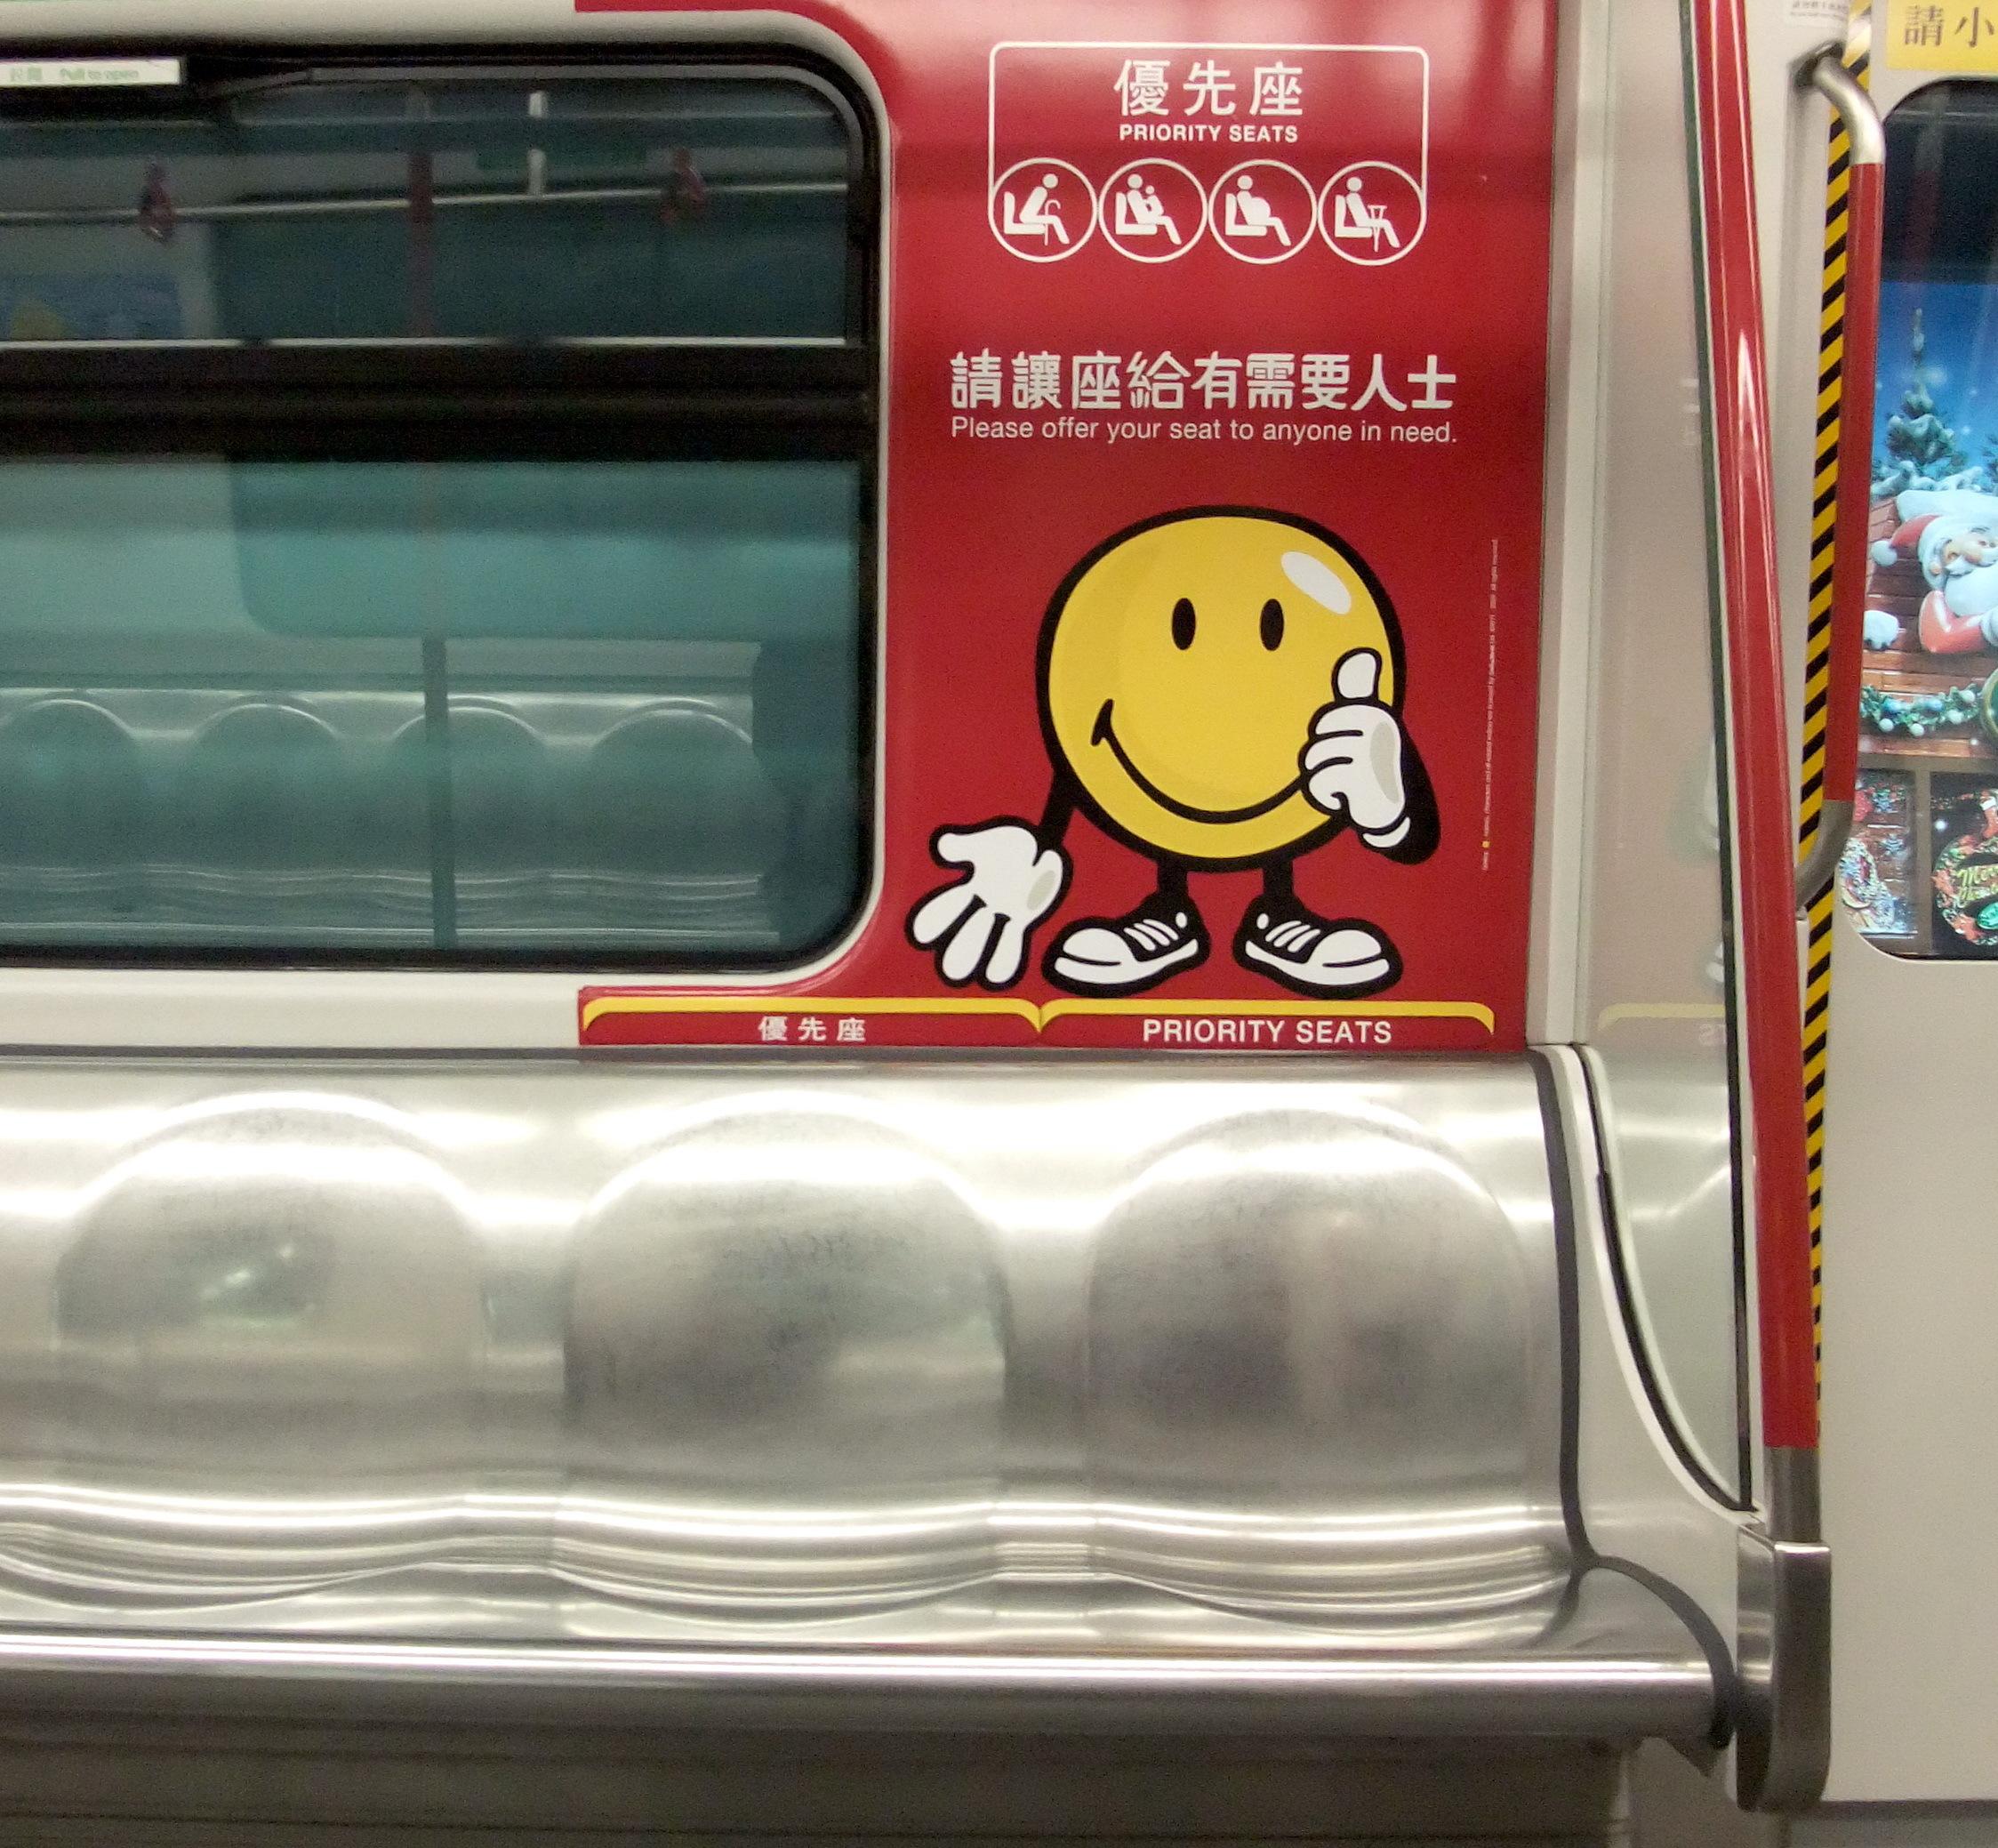 MTR seat